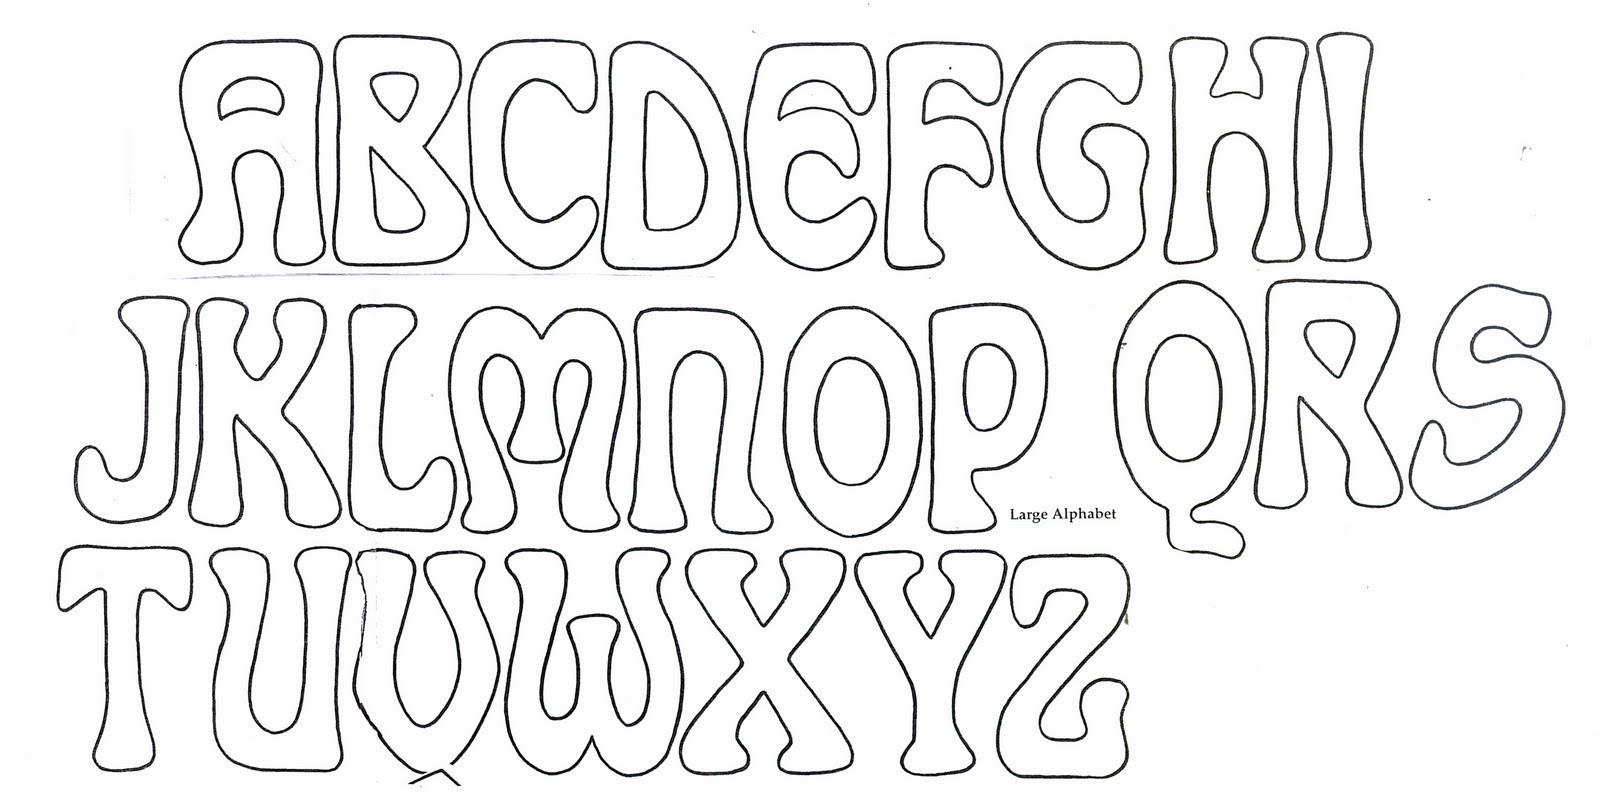 fancy letter templates Targer golden dragon